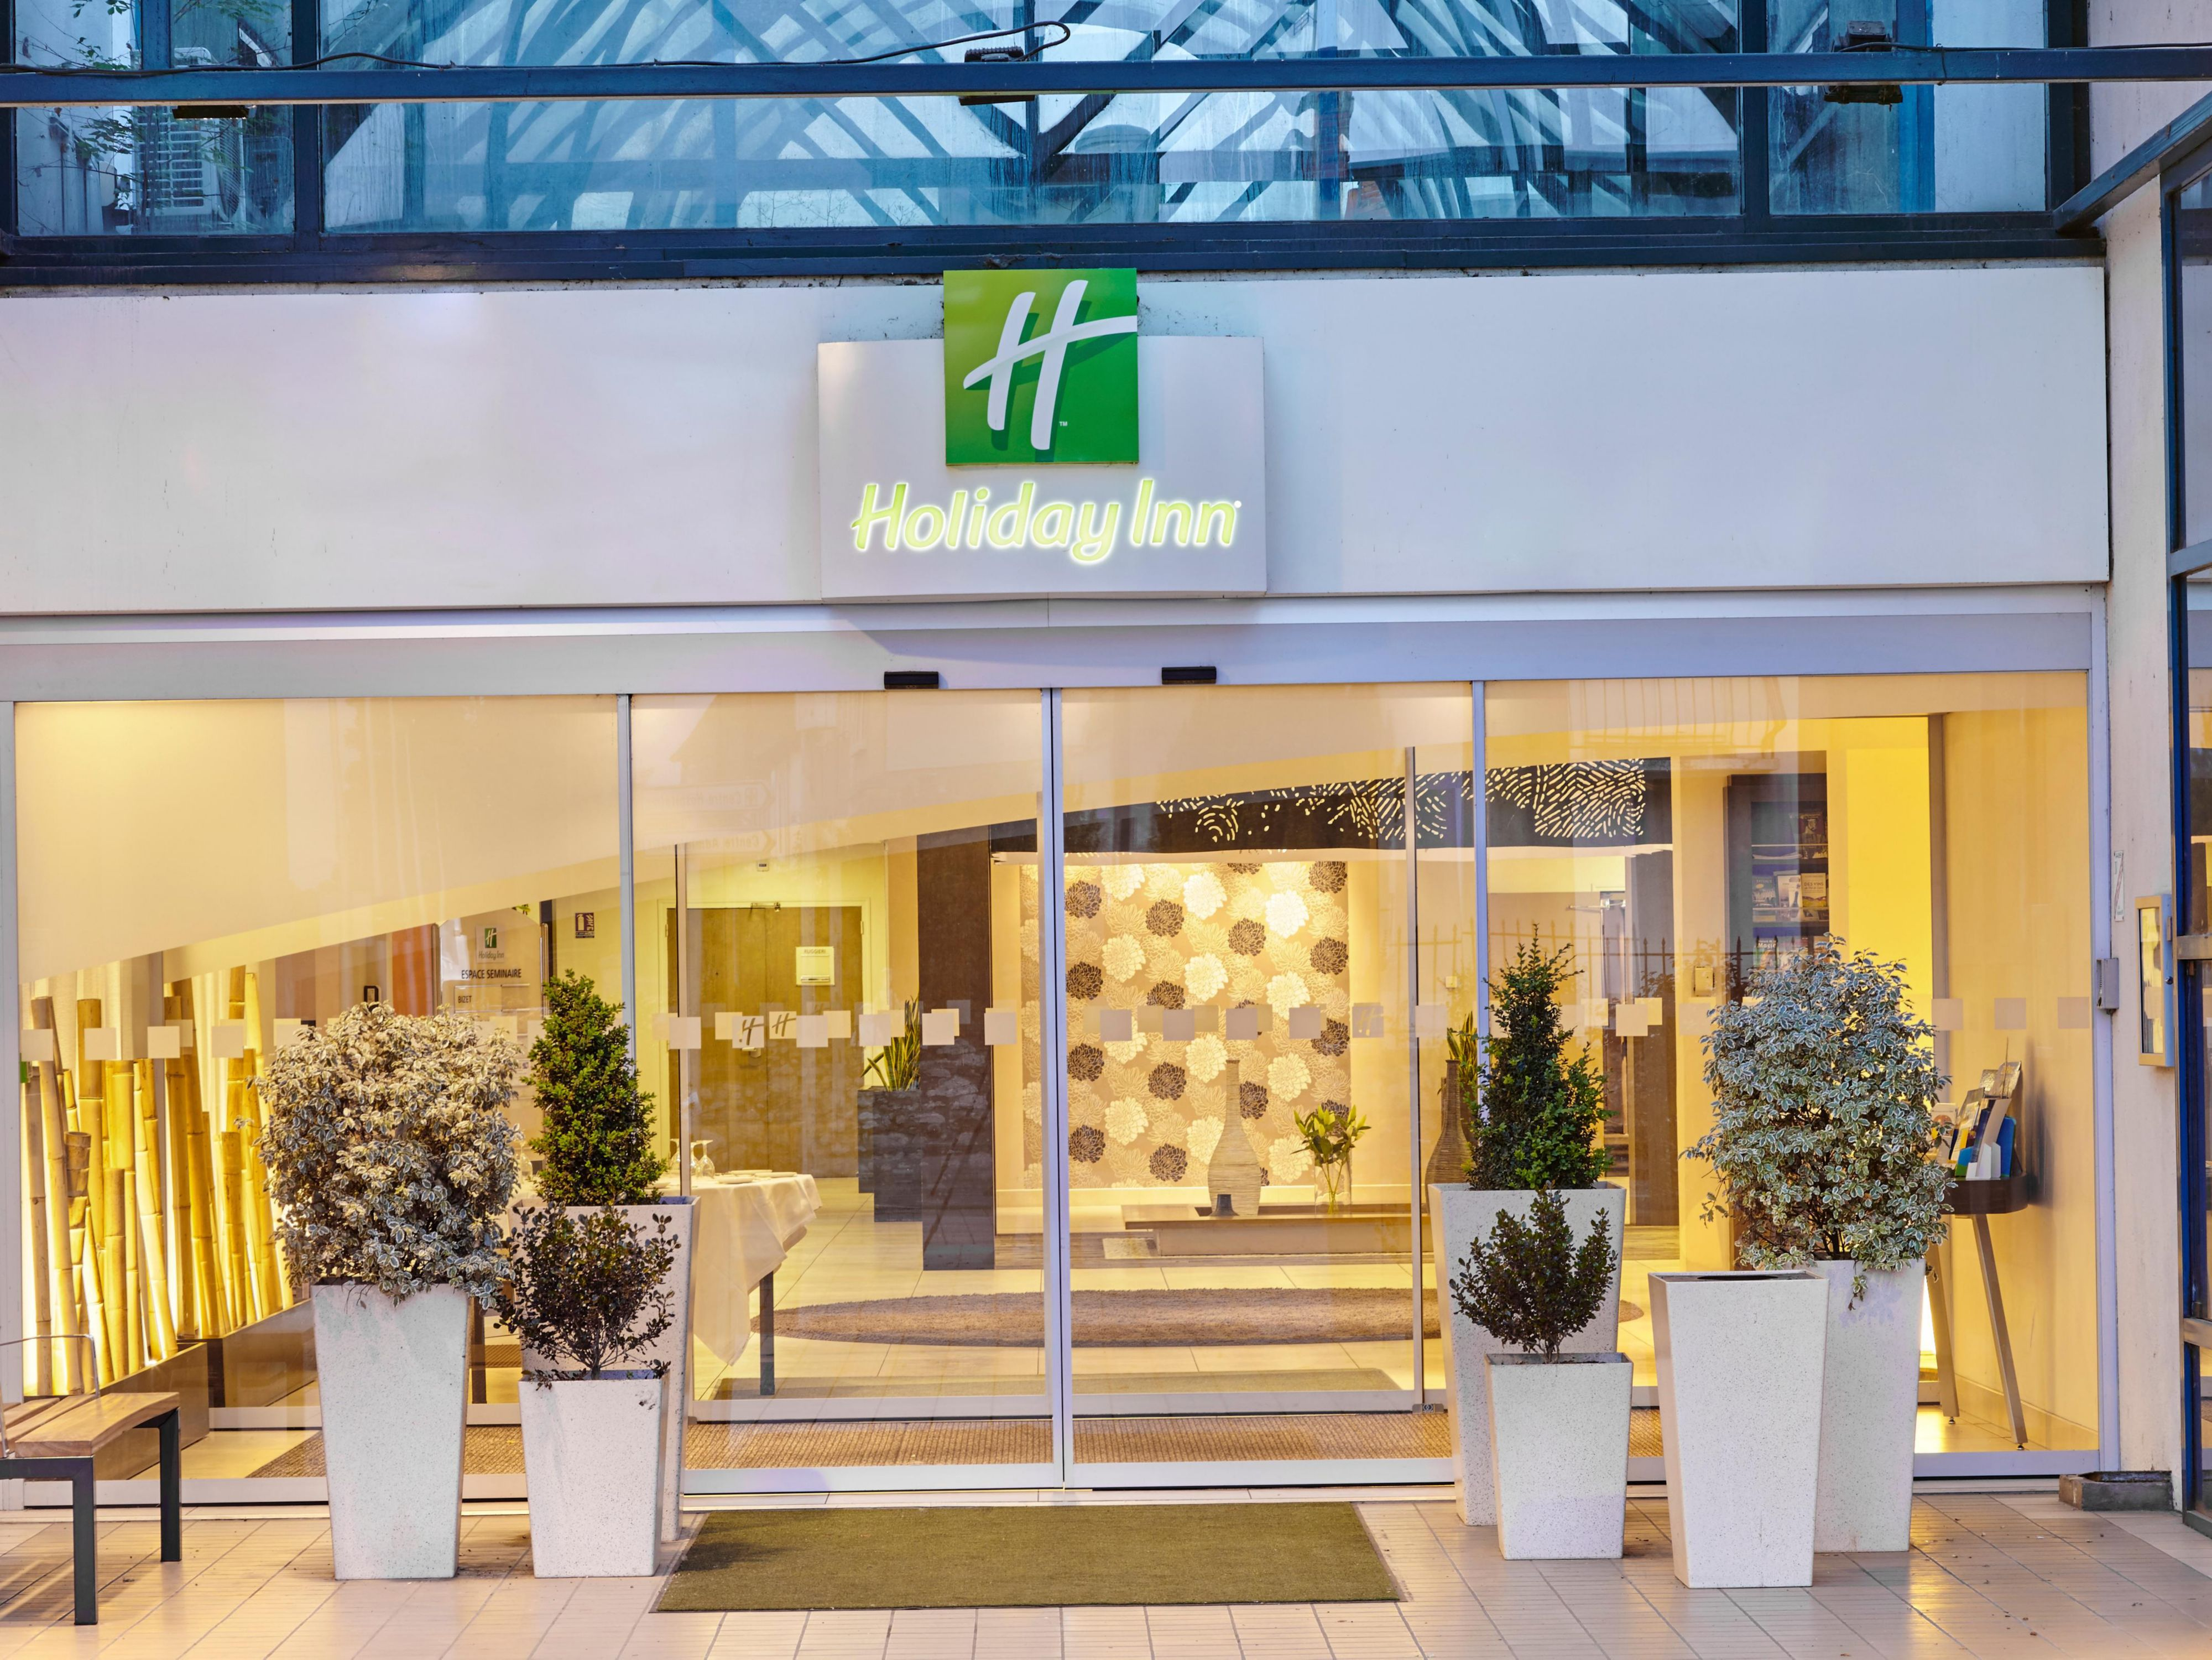 holiday inn hotel france: